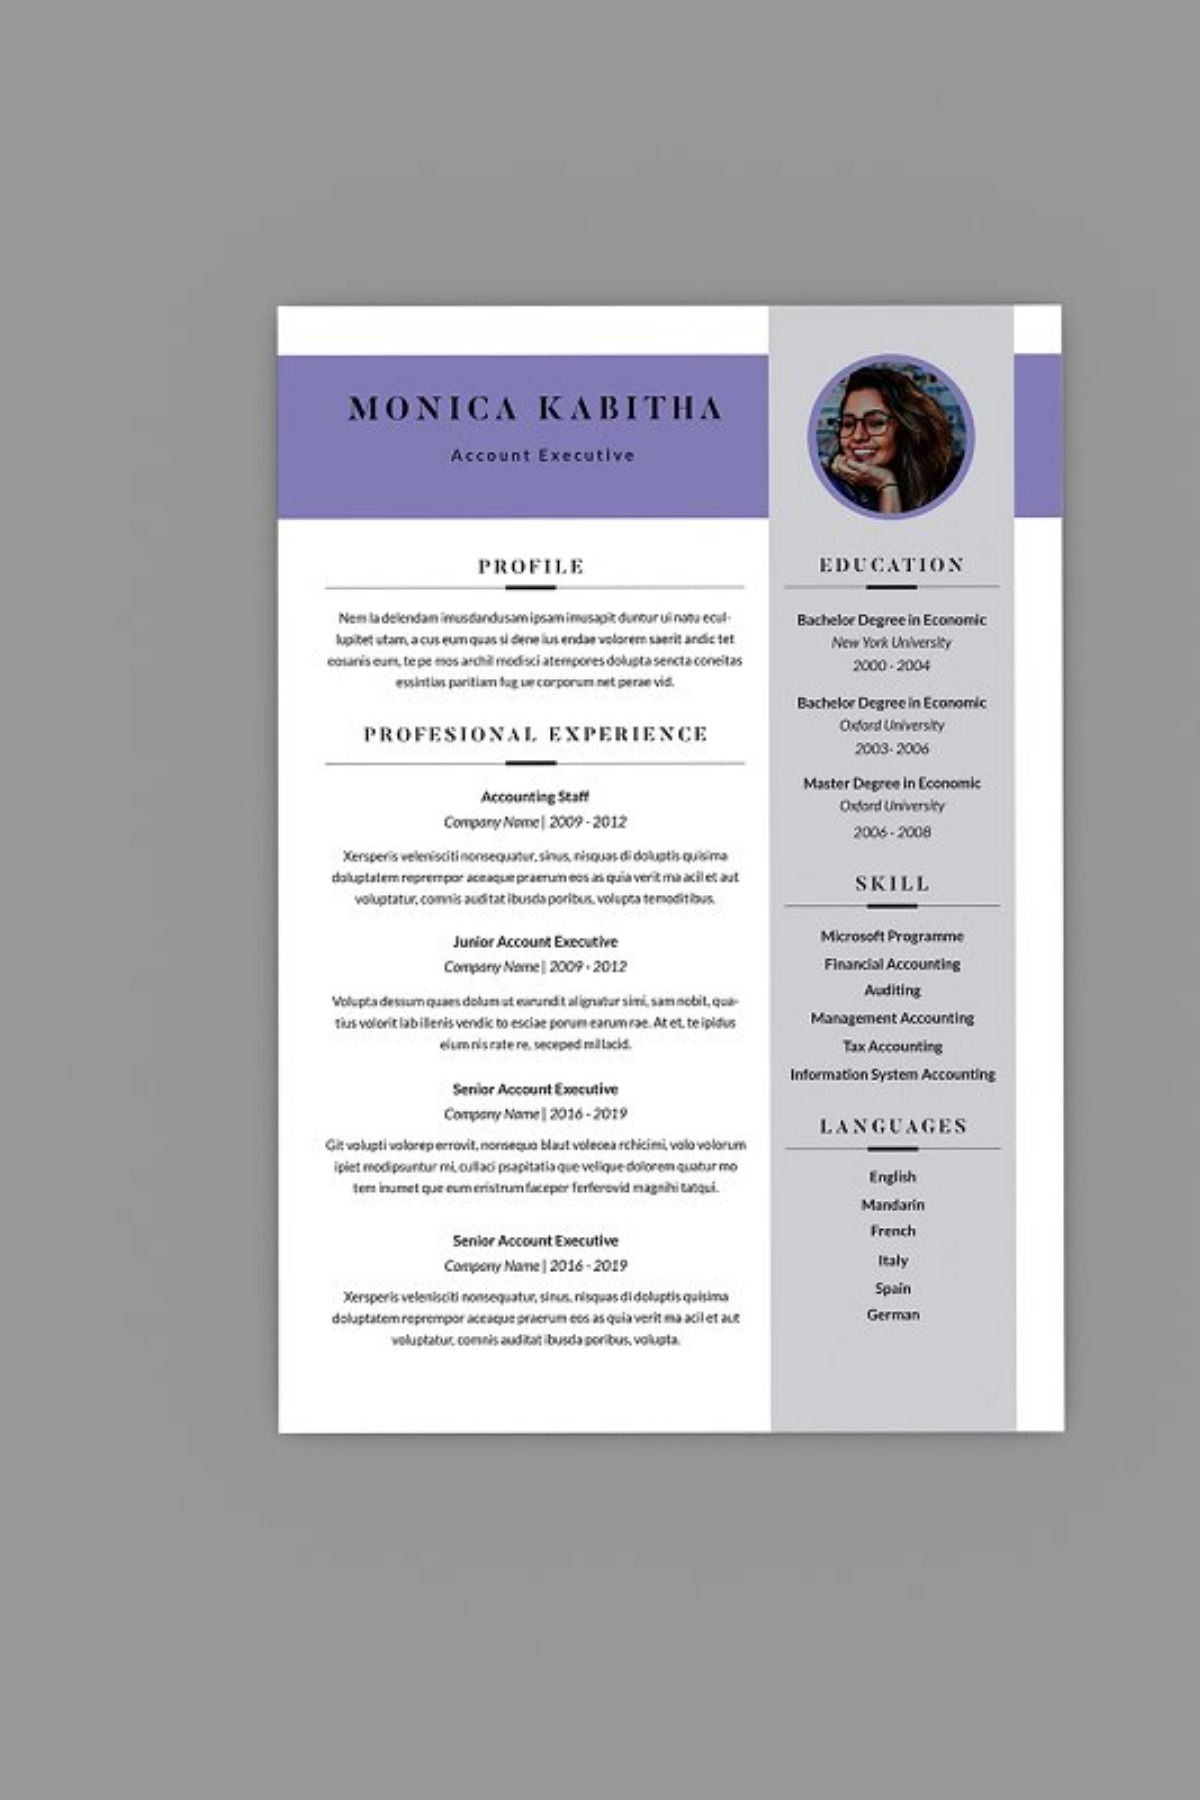 Caliber CV Resume Designer Resume words skills, Good